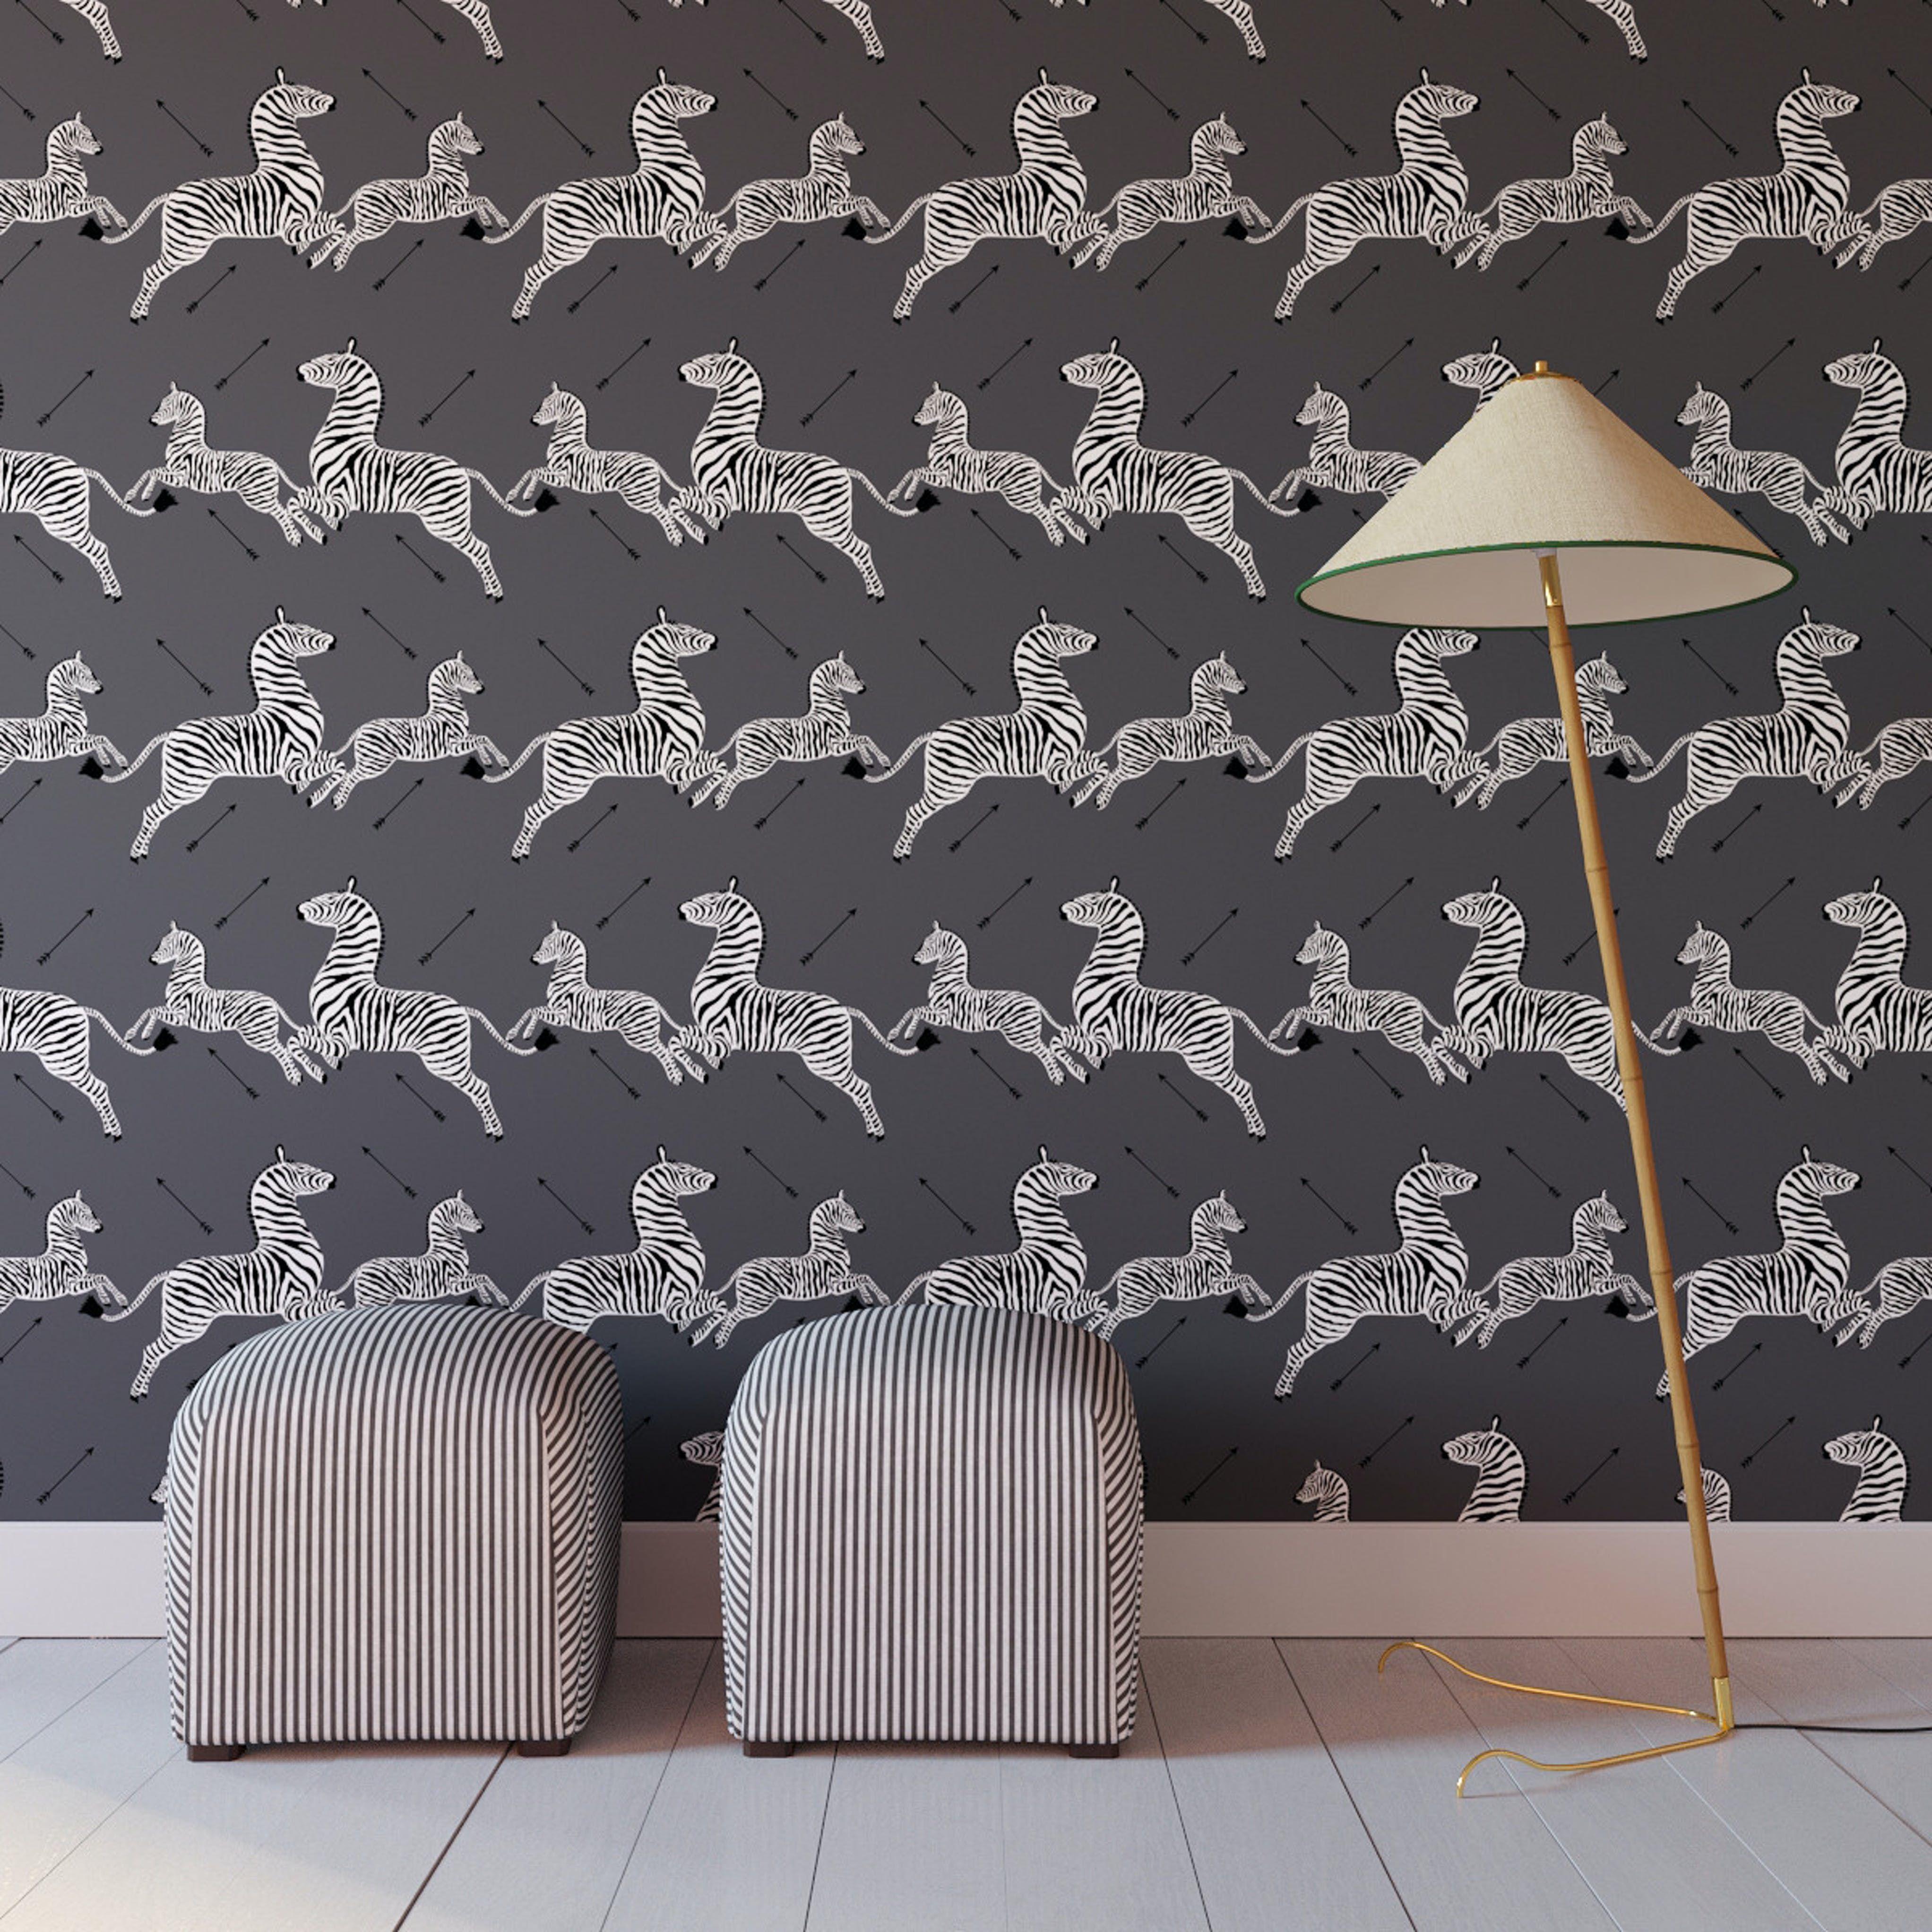 Slate Zebra Peel and Stick Wallpaper Roll in 2020